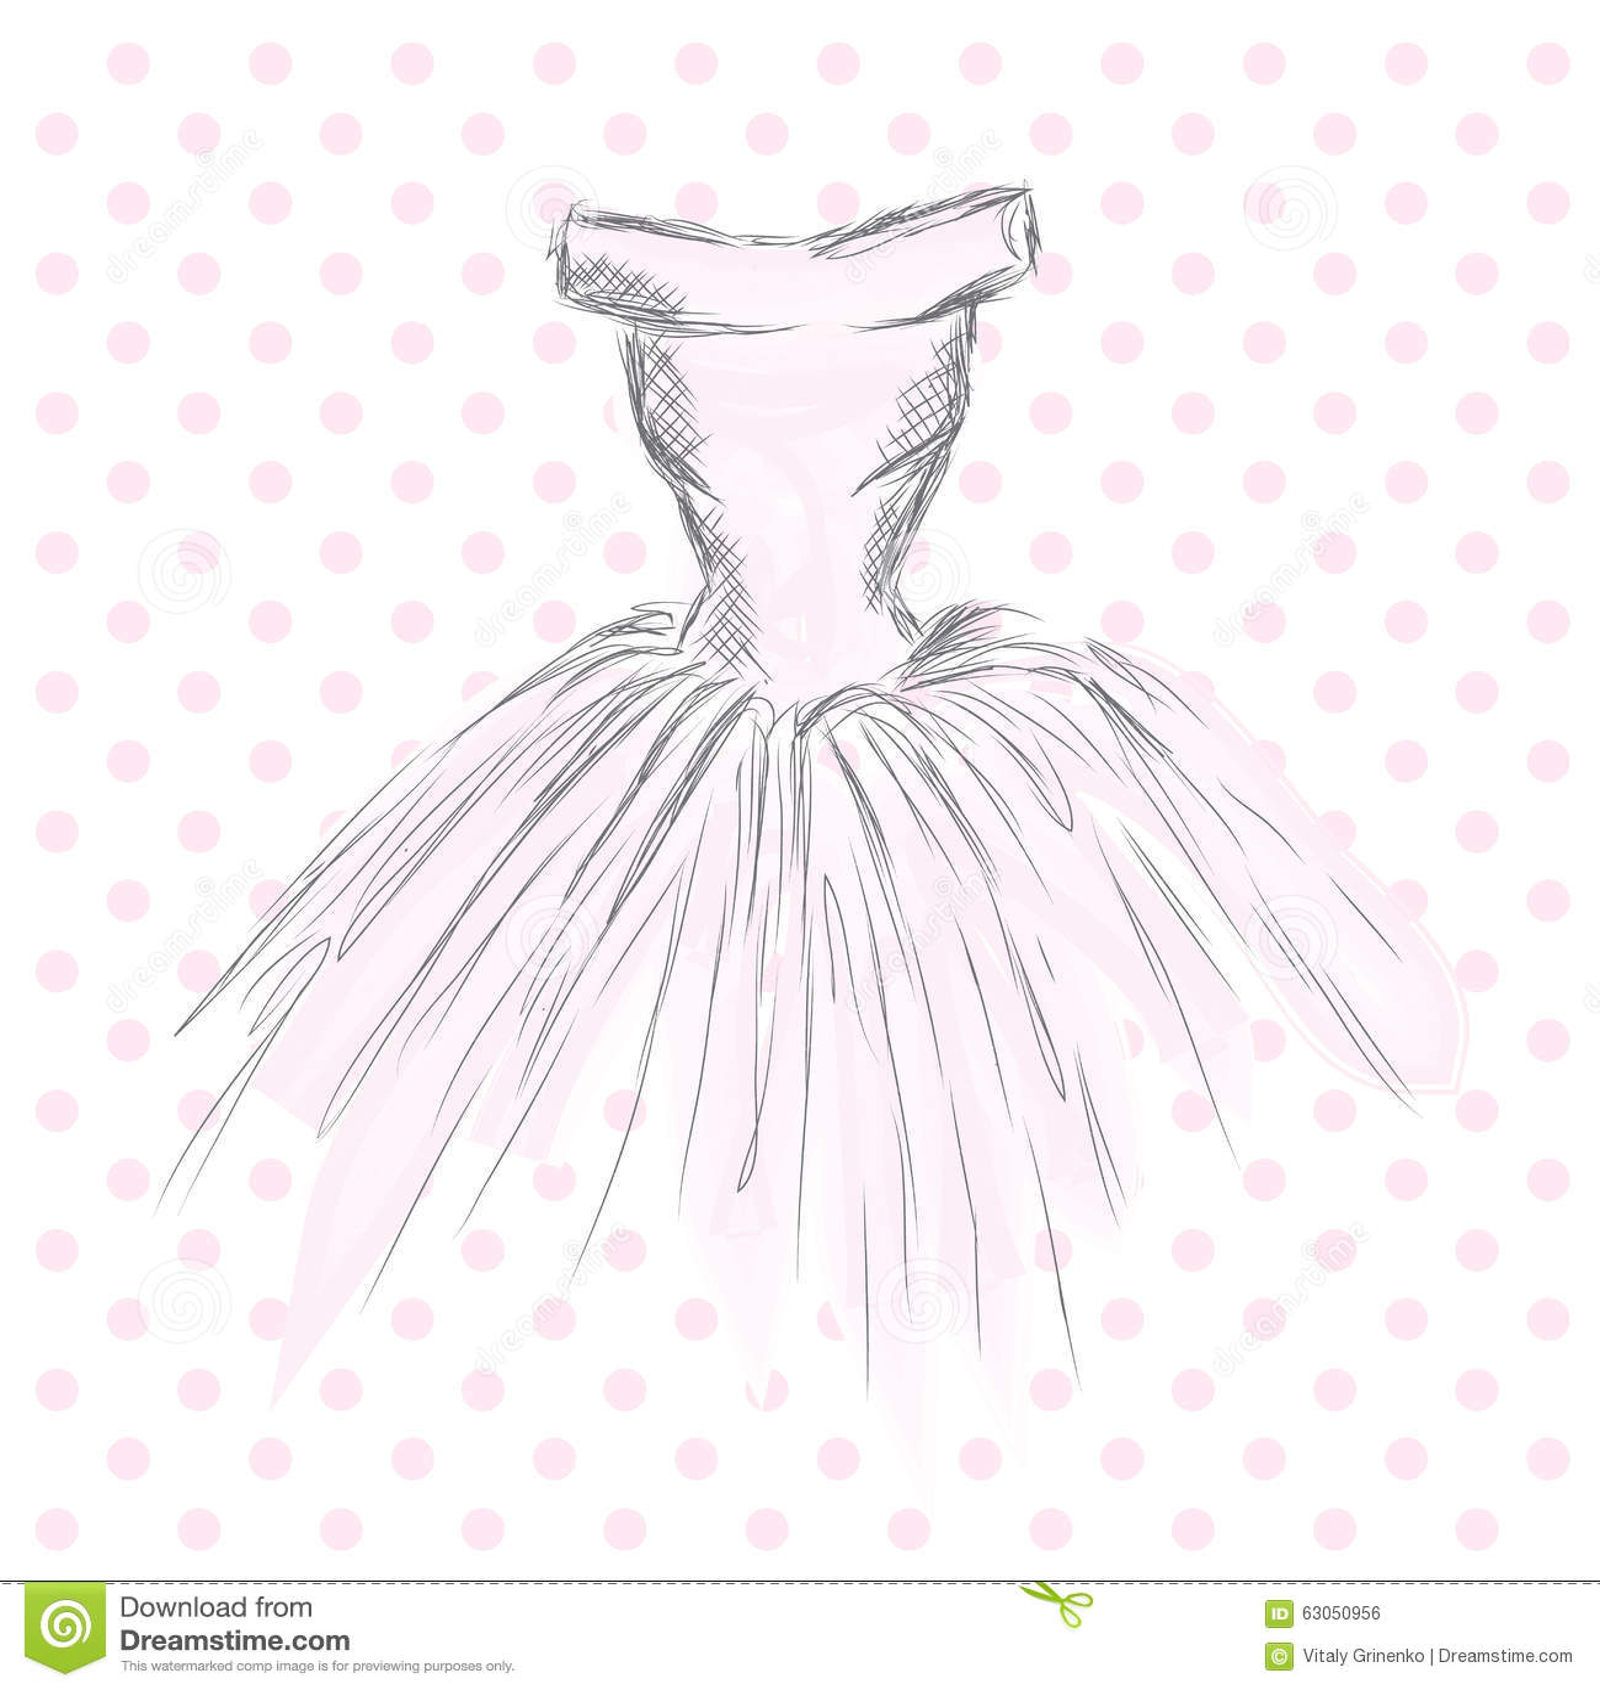 robe dans le vecteur v tements de dessin de main cru mode illustration de vecteur image 63050956. Black Bedroom Furniture Sets. Home Design Ideas